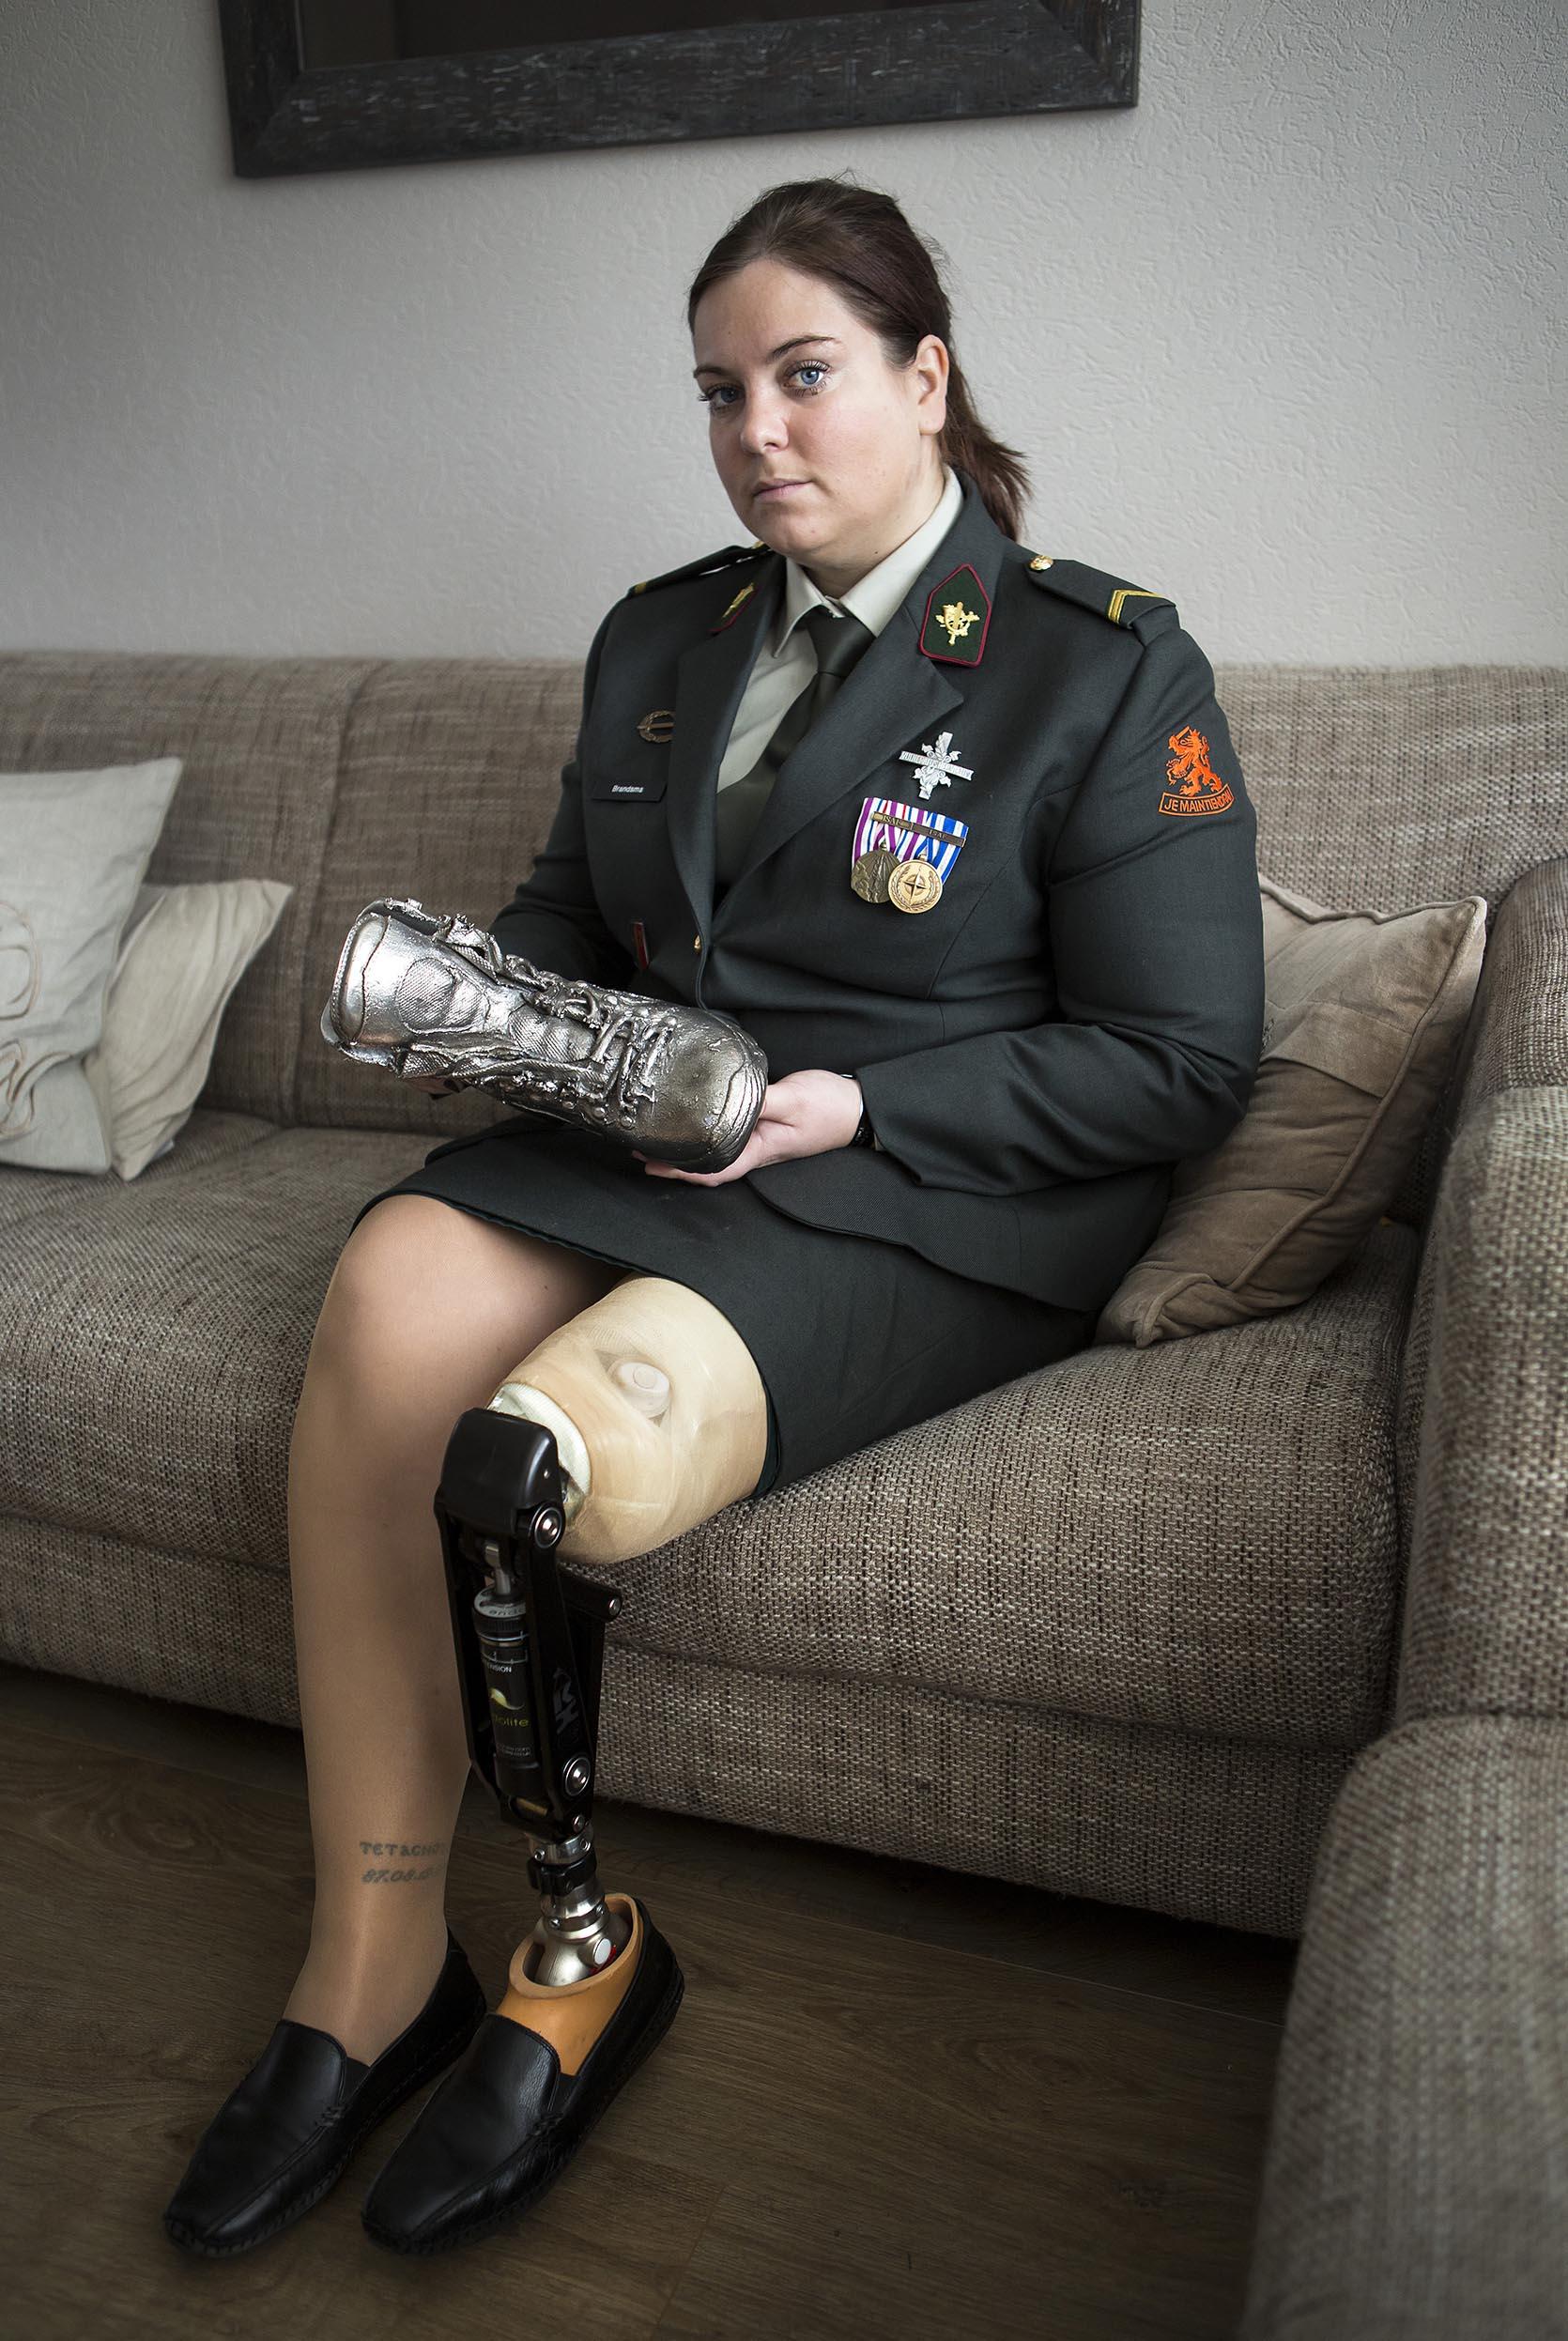 'Veterans'